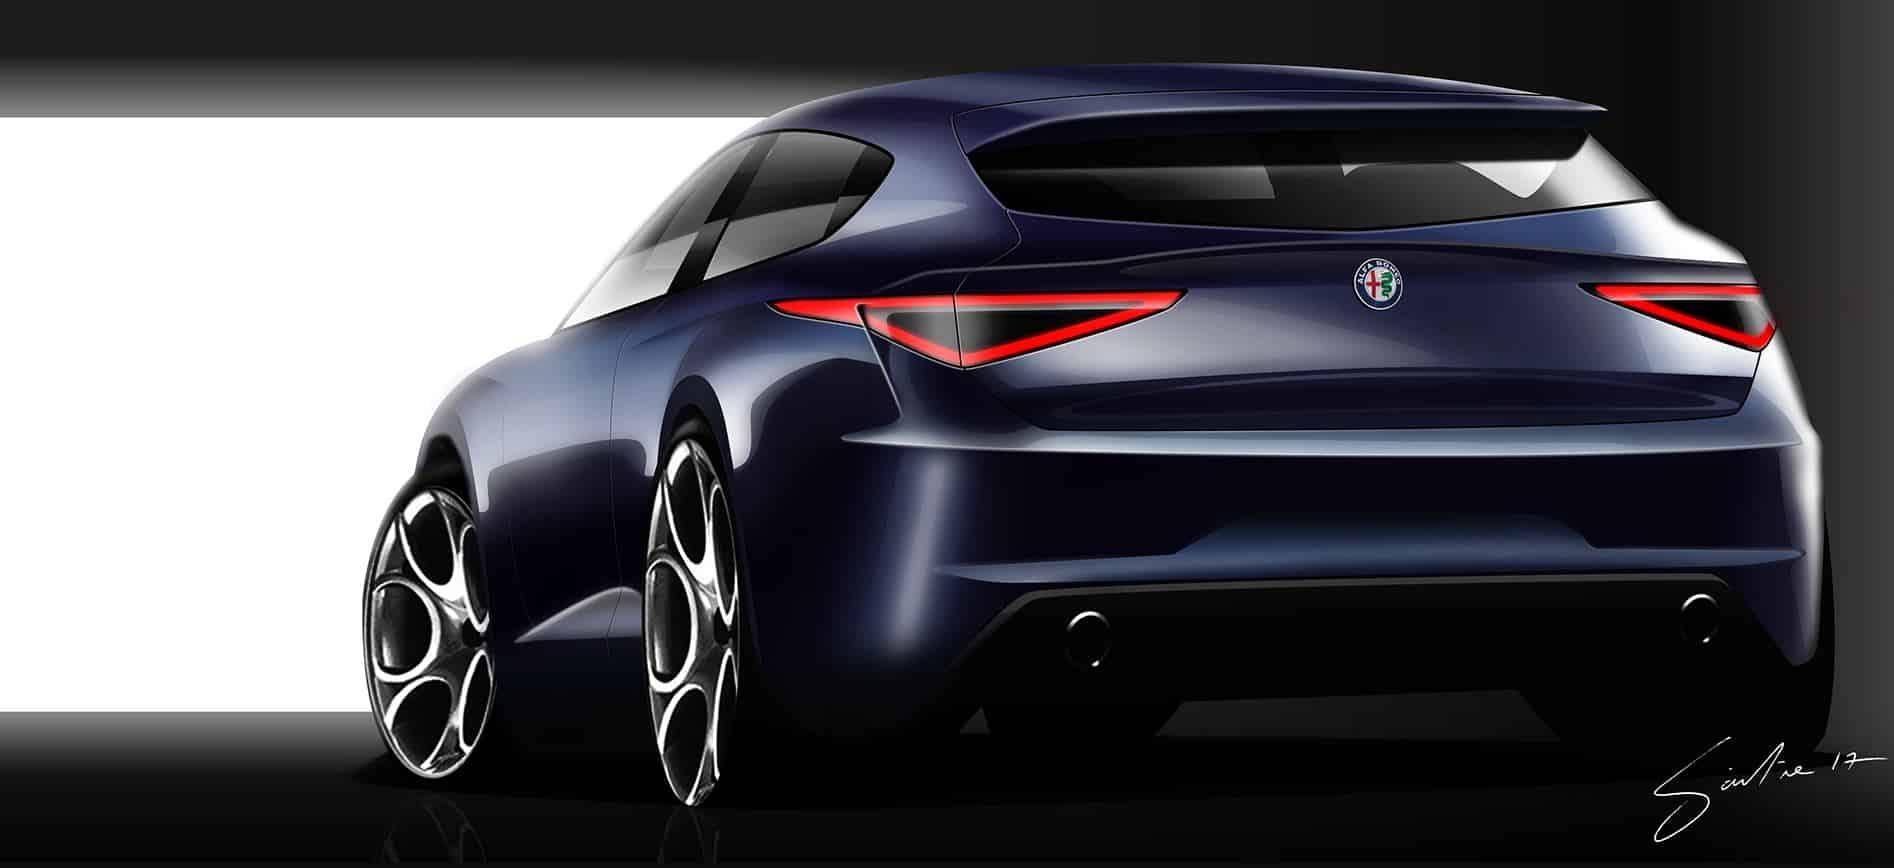 Por favor Alfa Romeo, el segmento necesita un Giulietta como este…